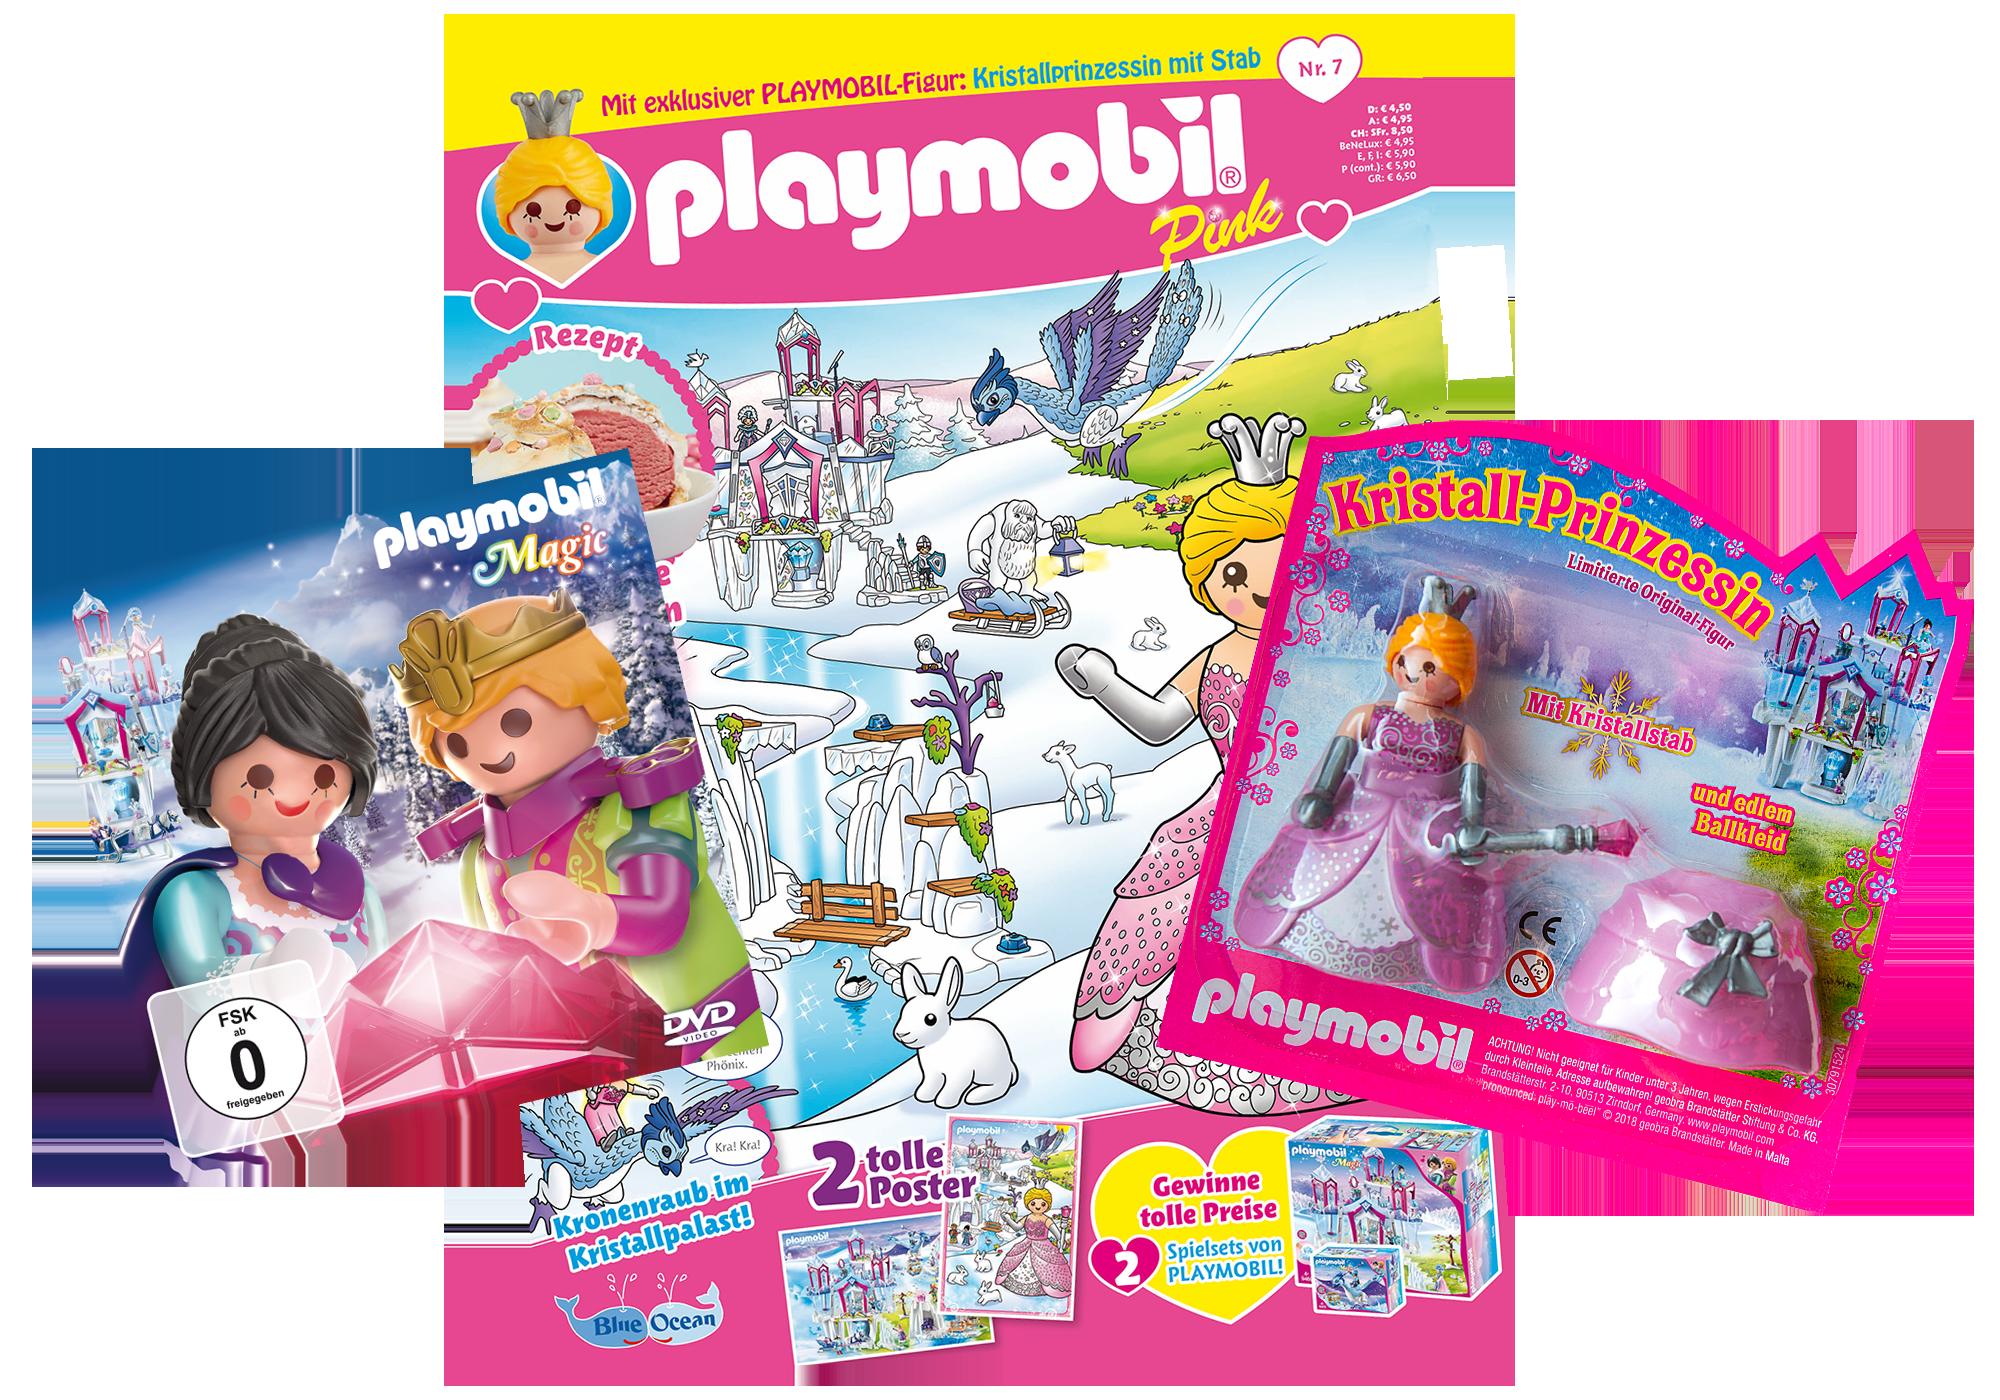 http://media.playmobil.com/i/playmobil/80614_product_detail